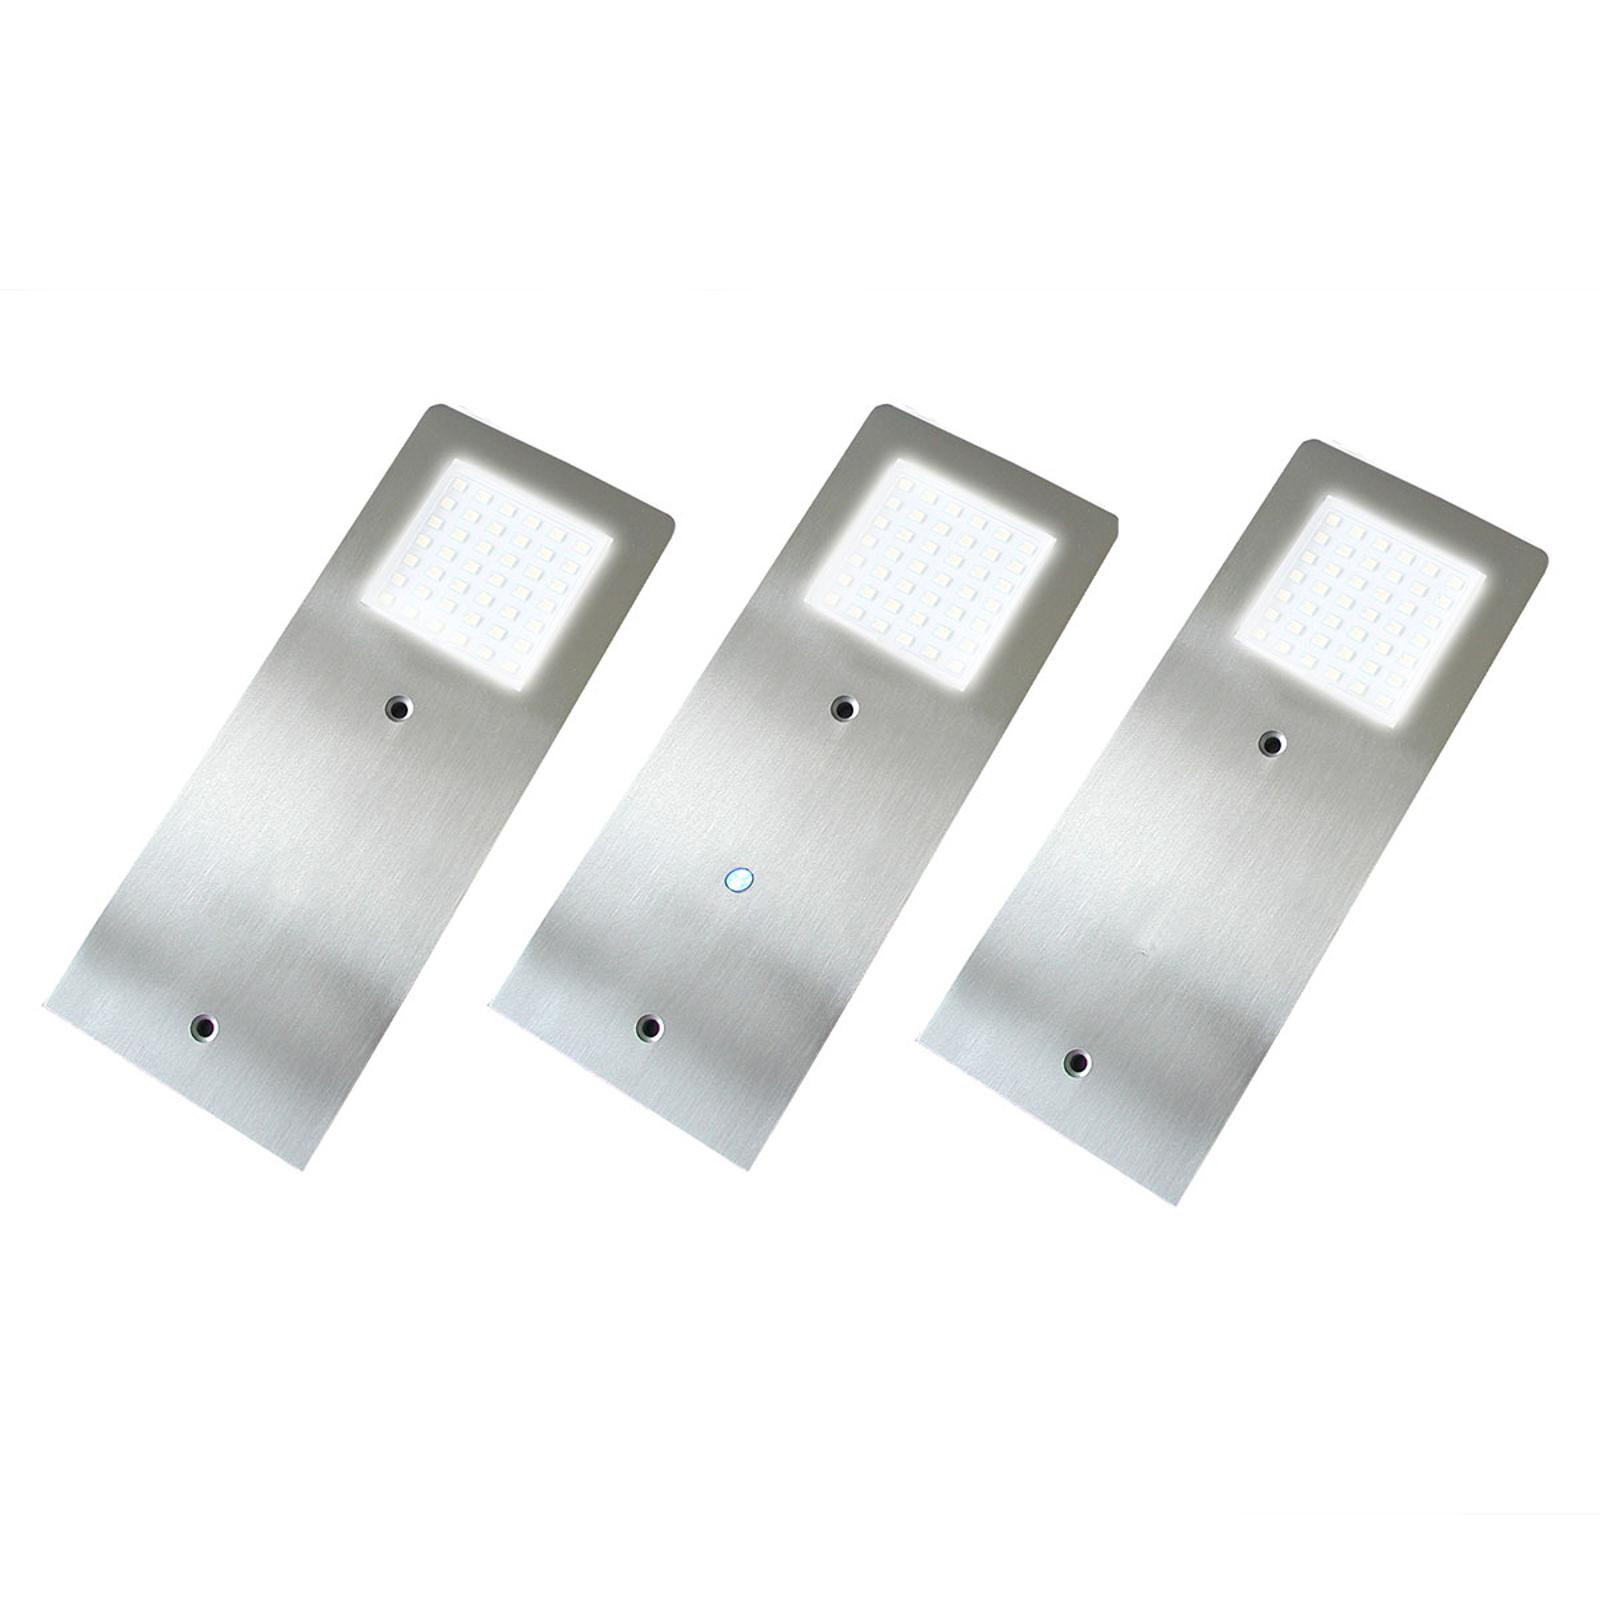 Ultraflache LED-Unterbauleuchte Alustar 3er Set